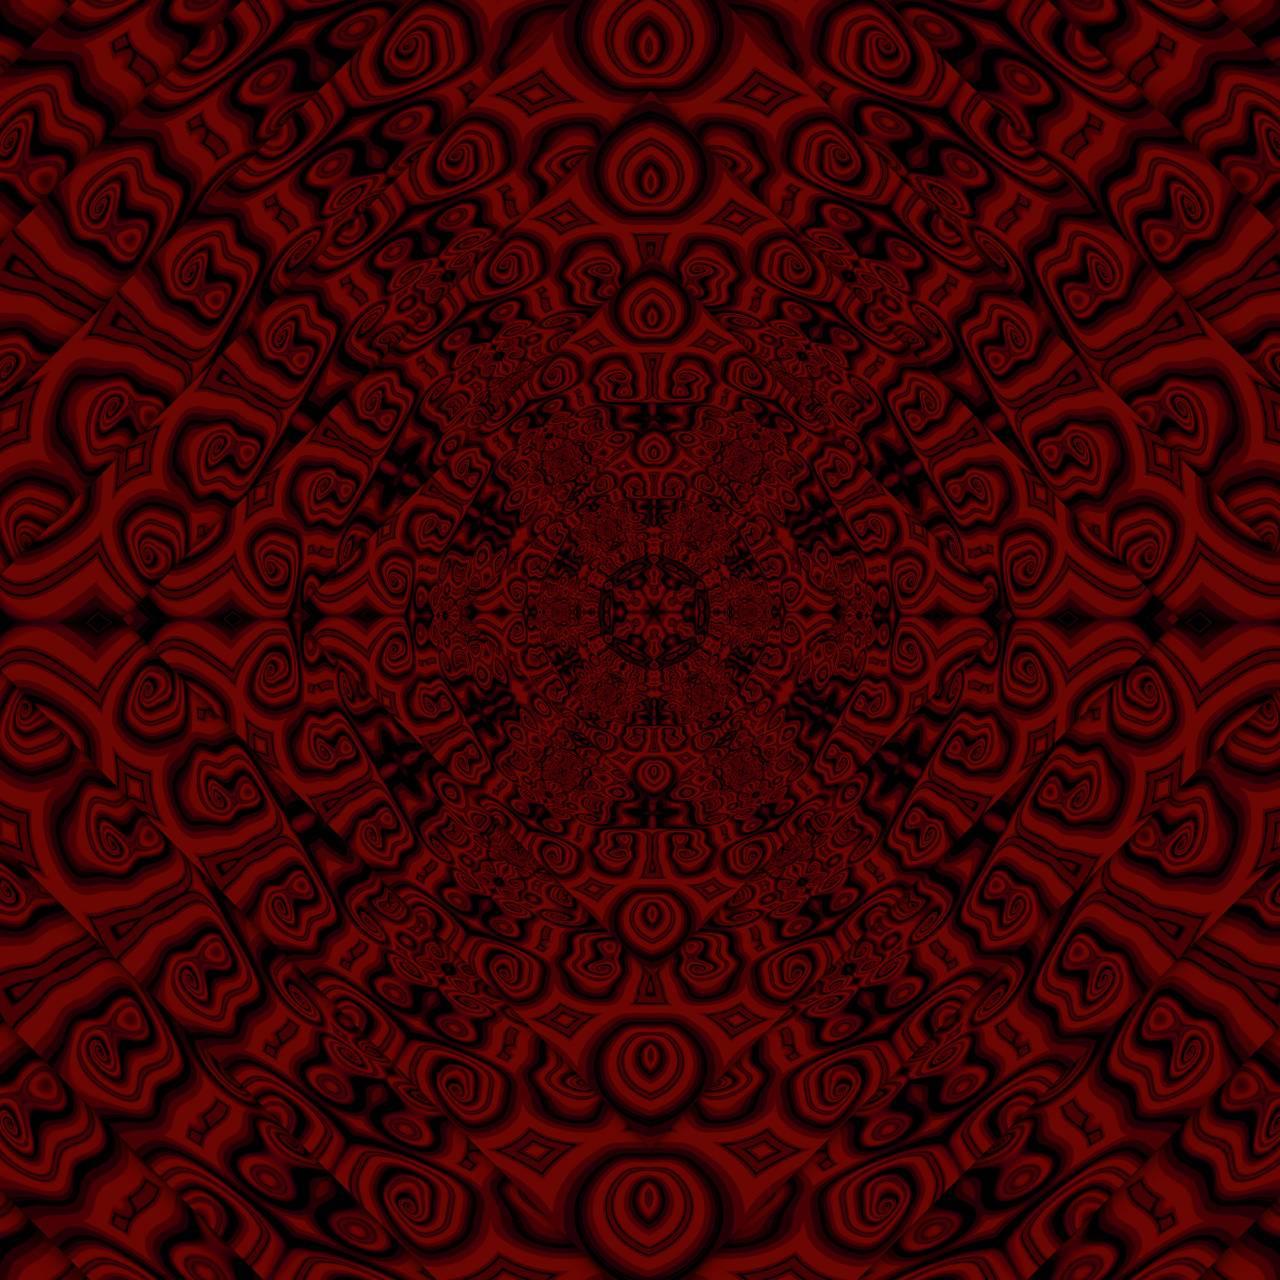 Red symmetric 2